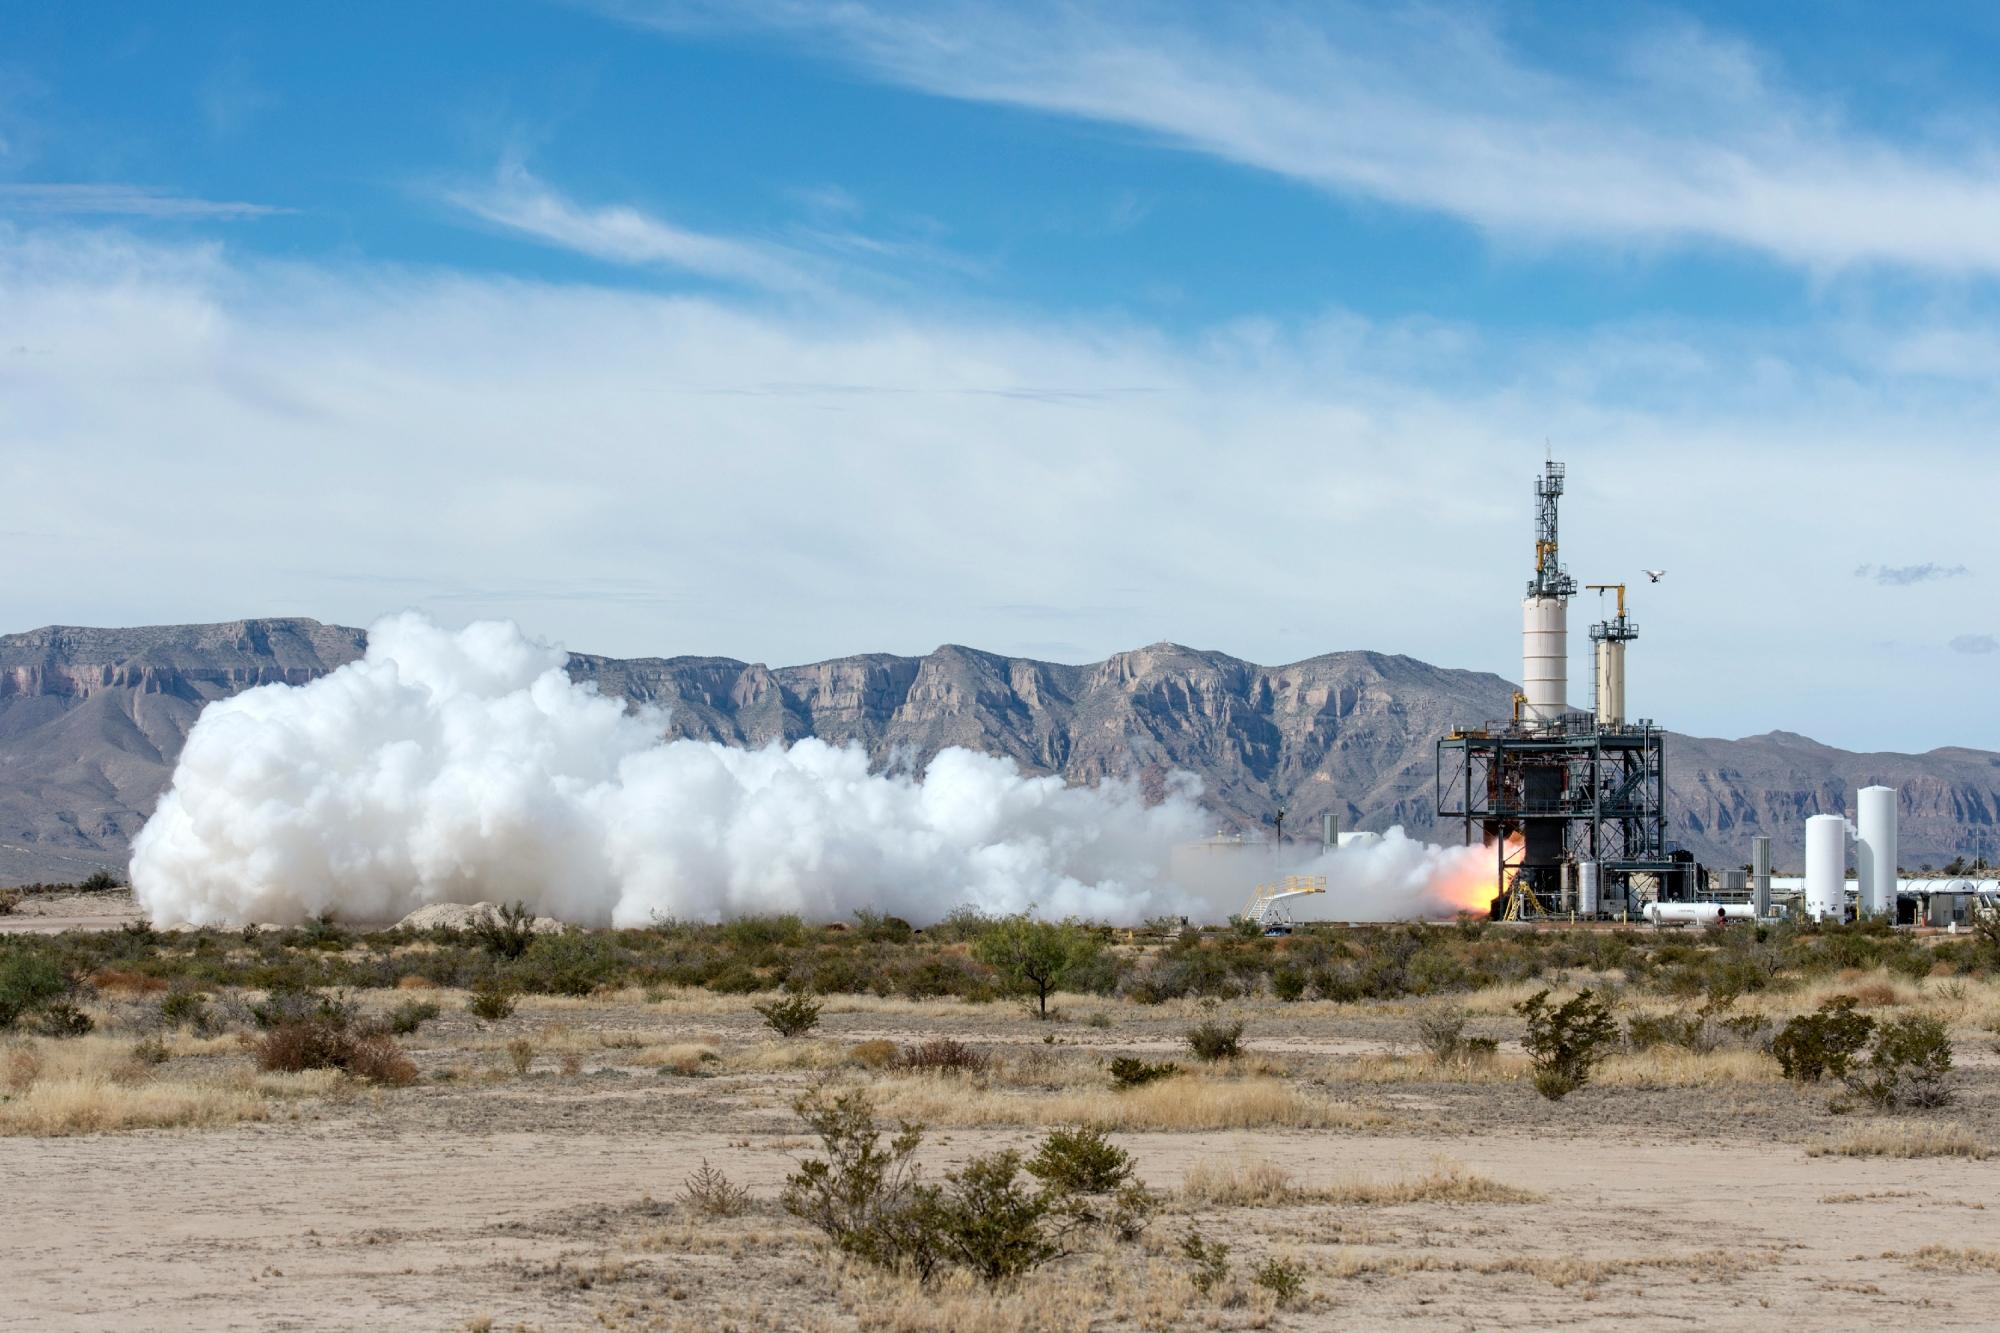 Jeff-Bezos-rocket-company-to-begin-suborbital-test-flights-this-year